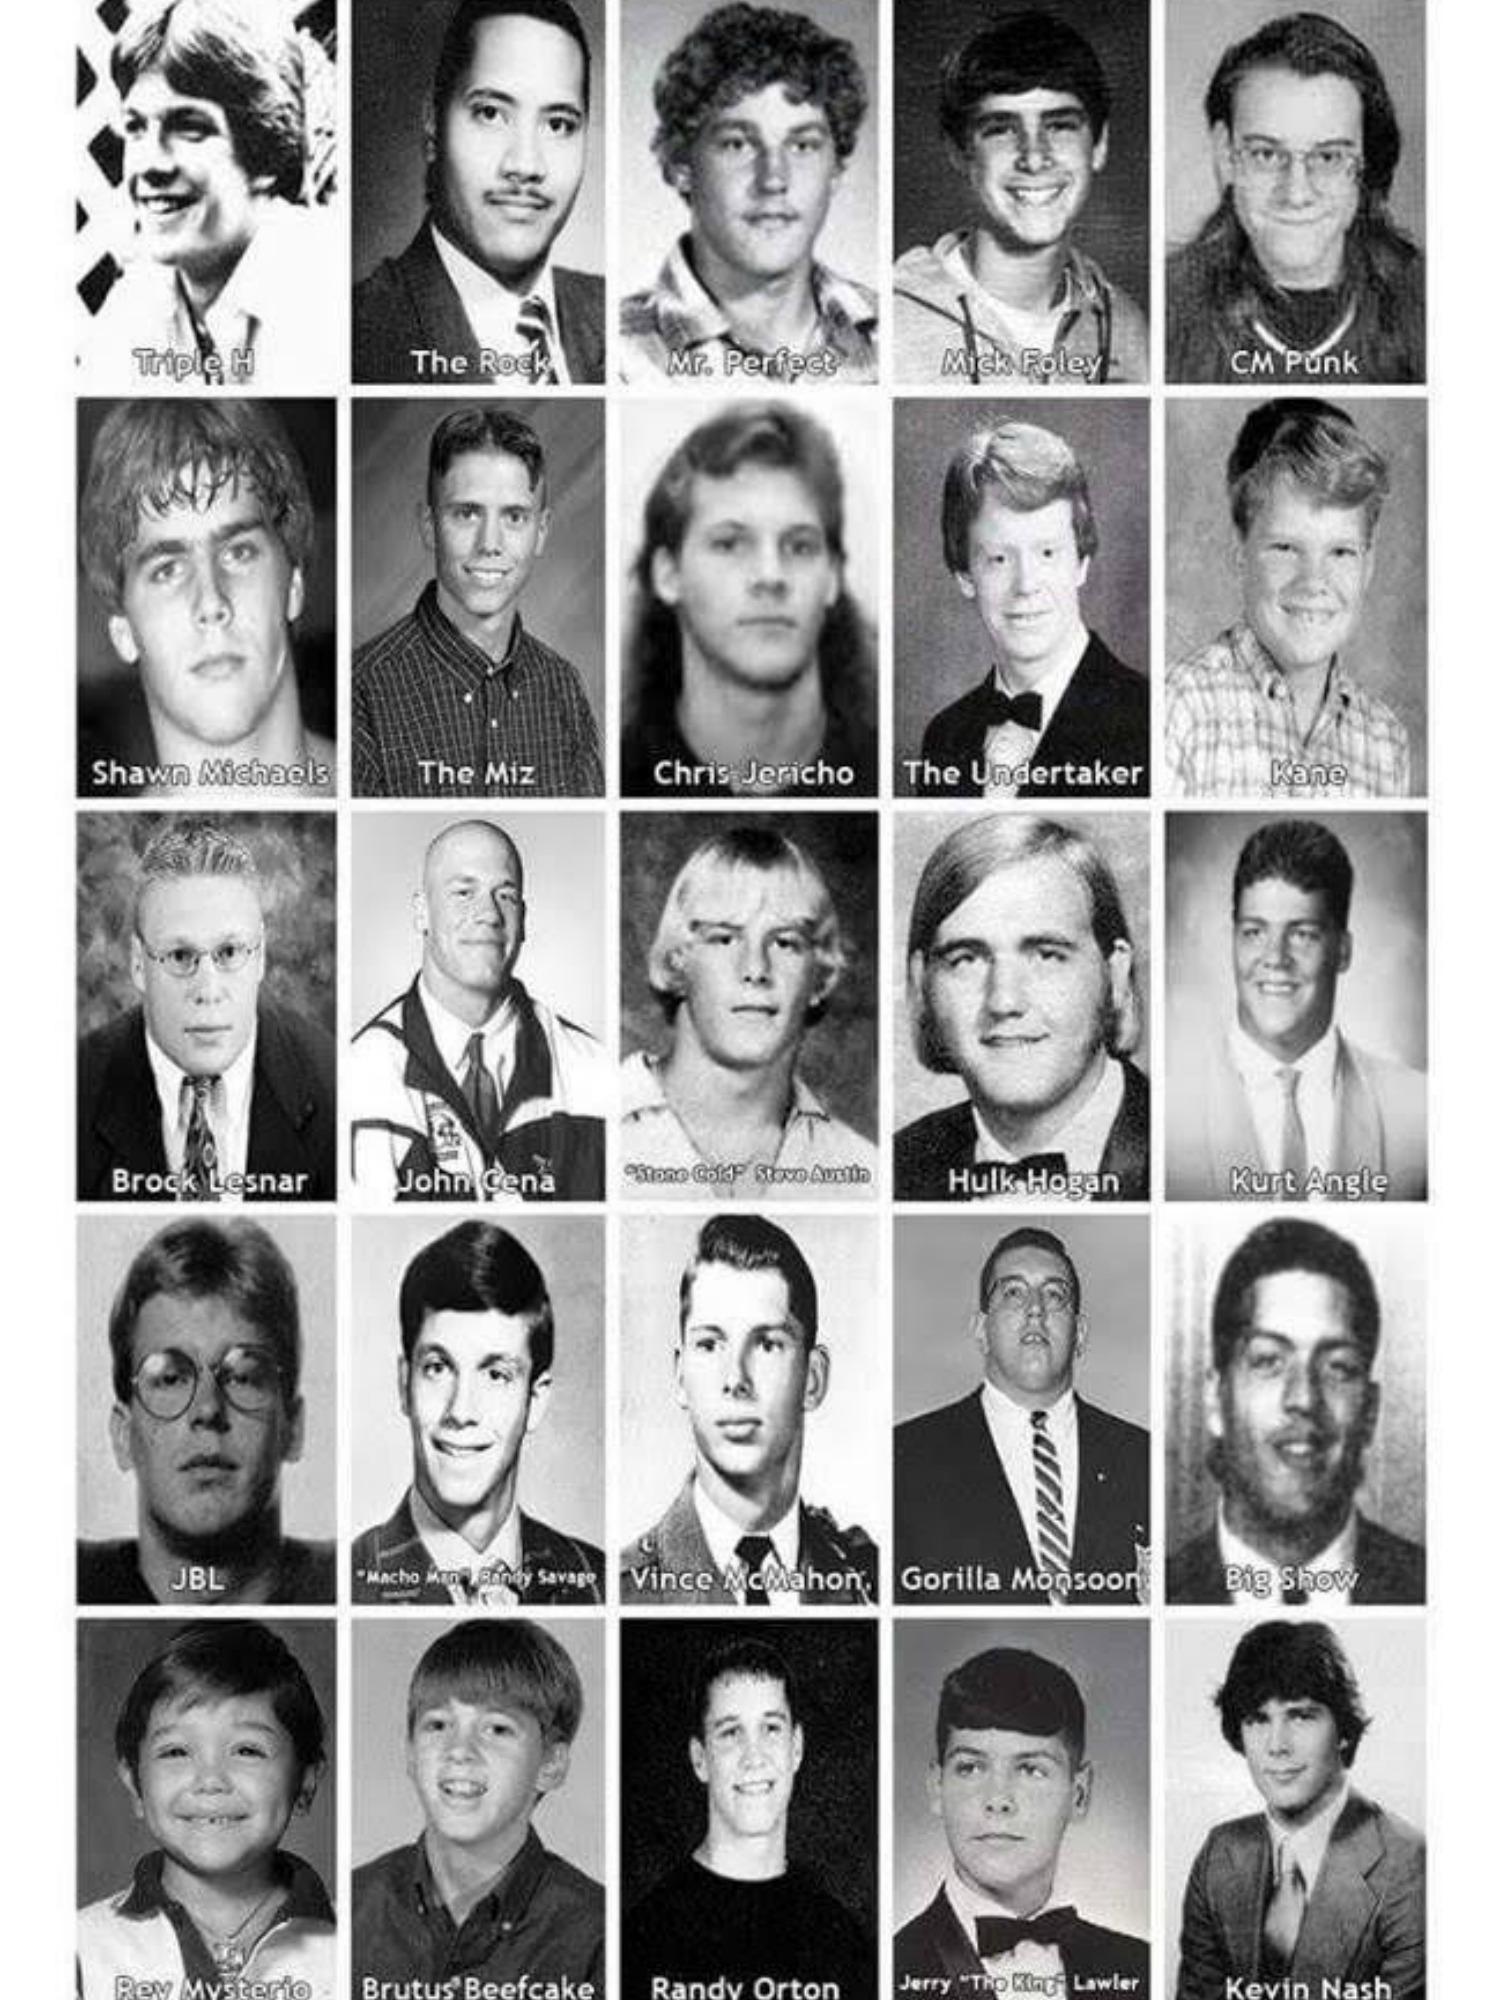 WWE wrestlers high school yearbook photos